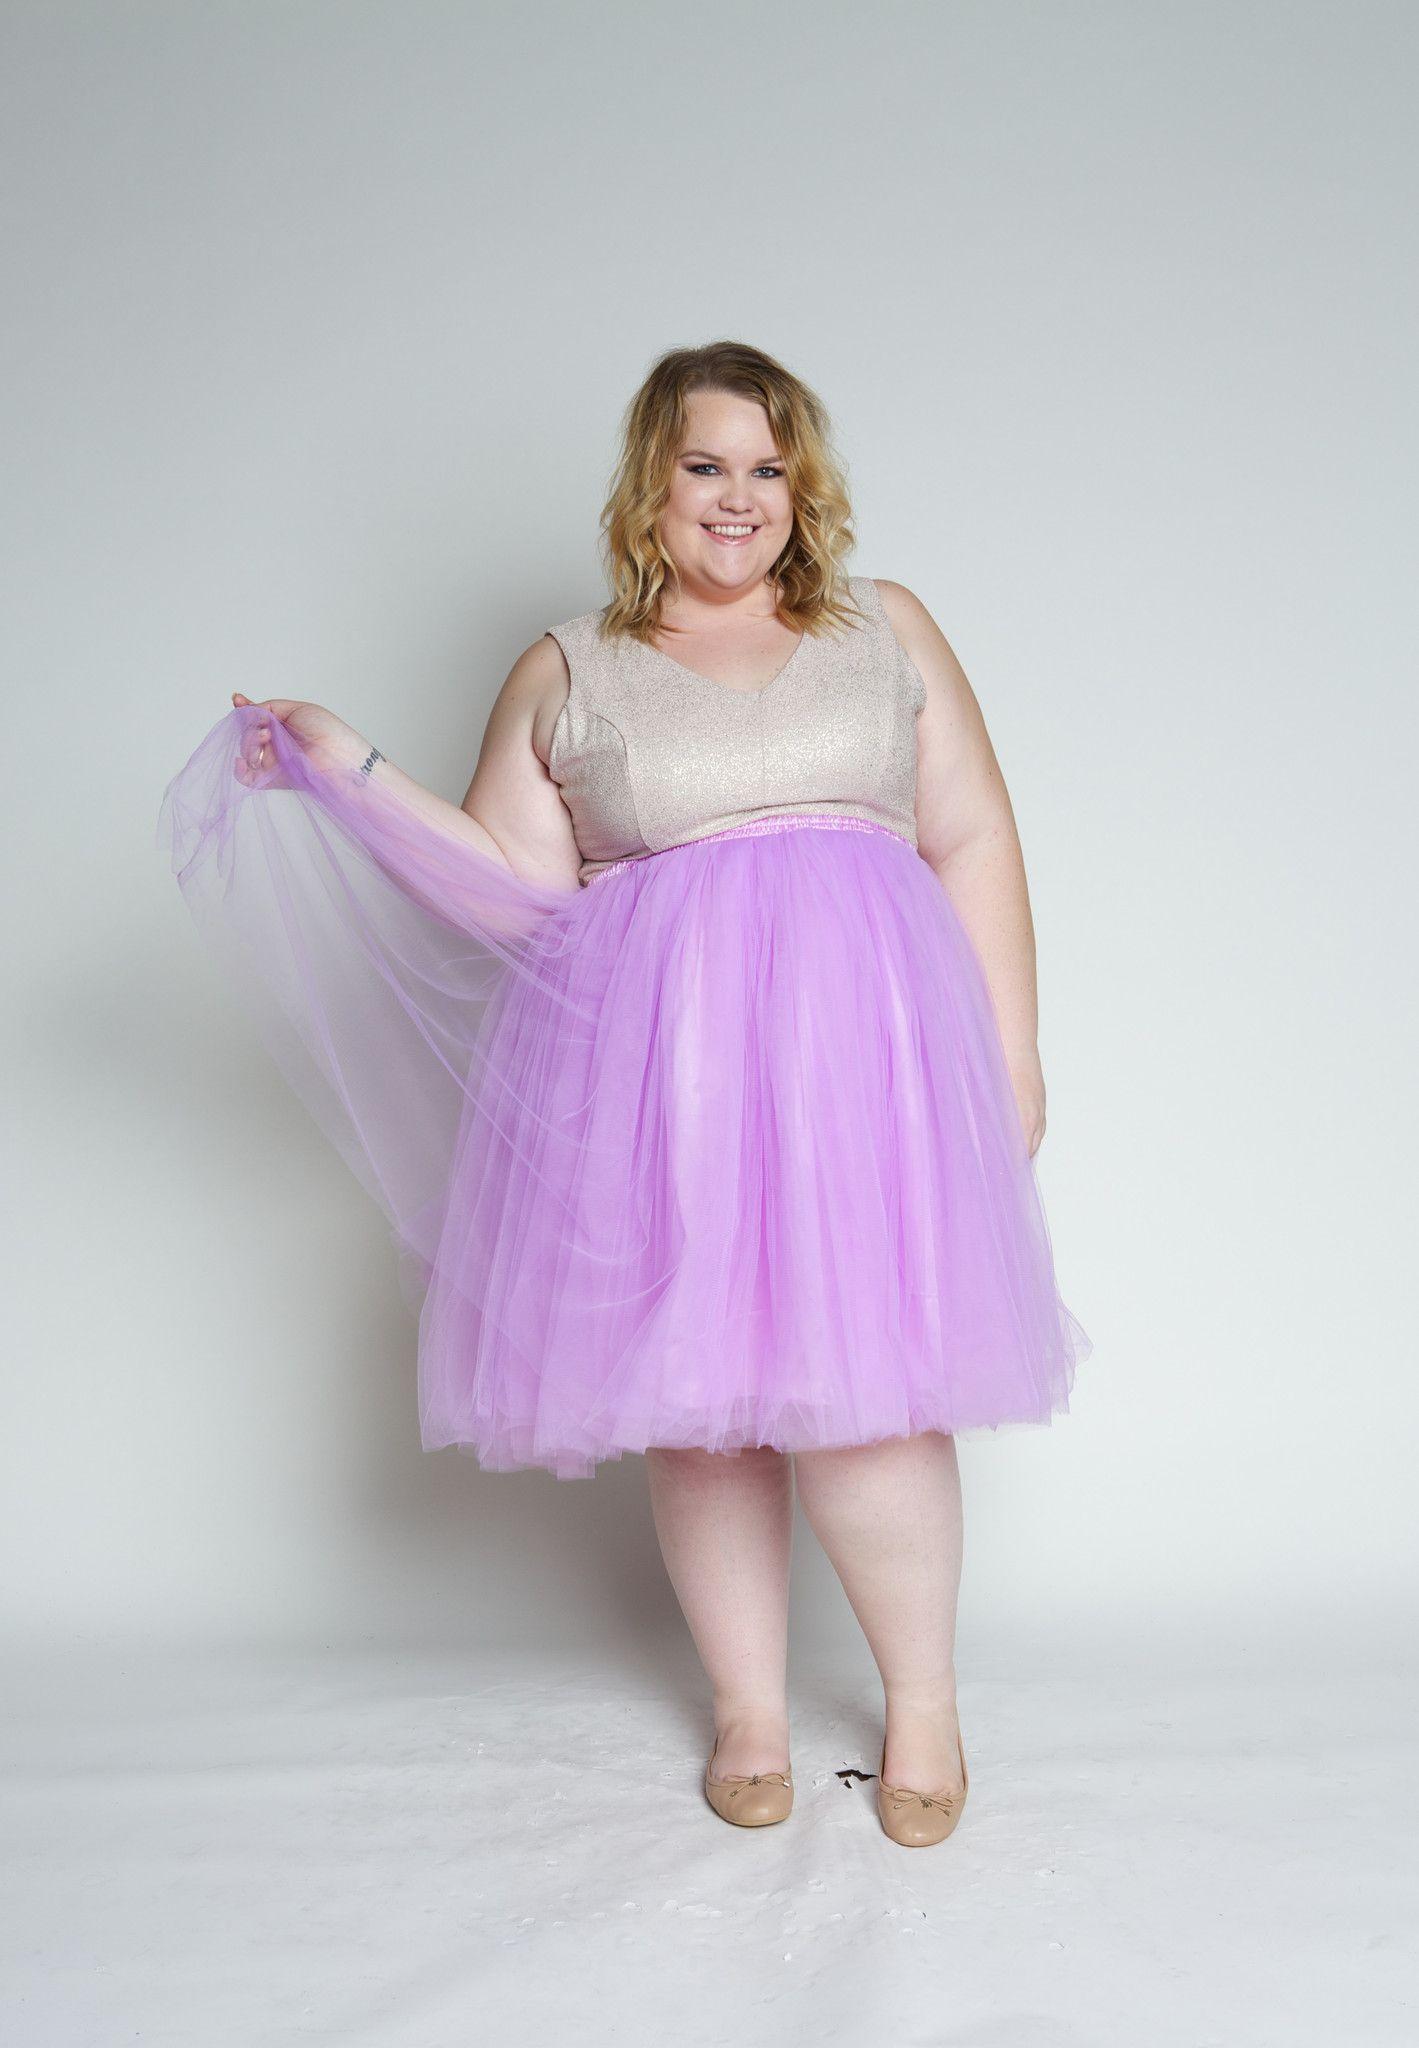 Plus Size Clothing For Women Cool Gal Tutu Lavender Sizes 1x